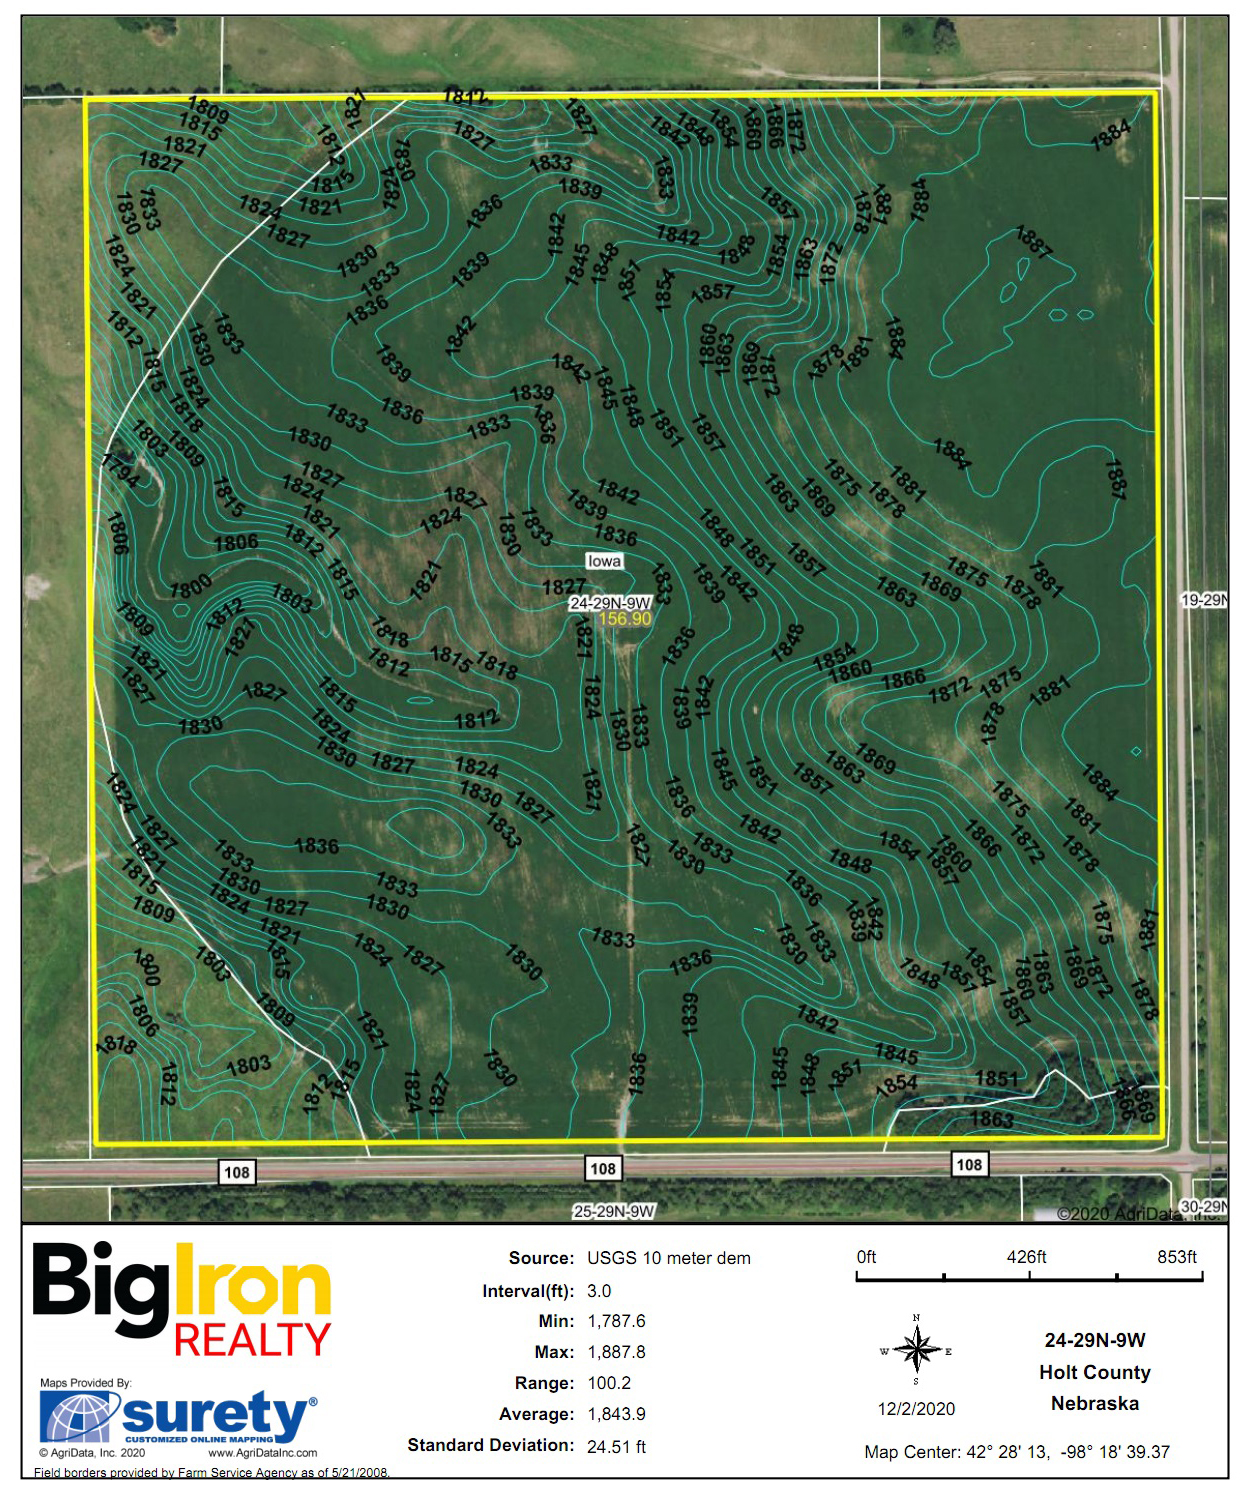 Topography Contours-2-BIR2101